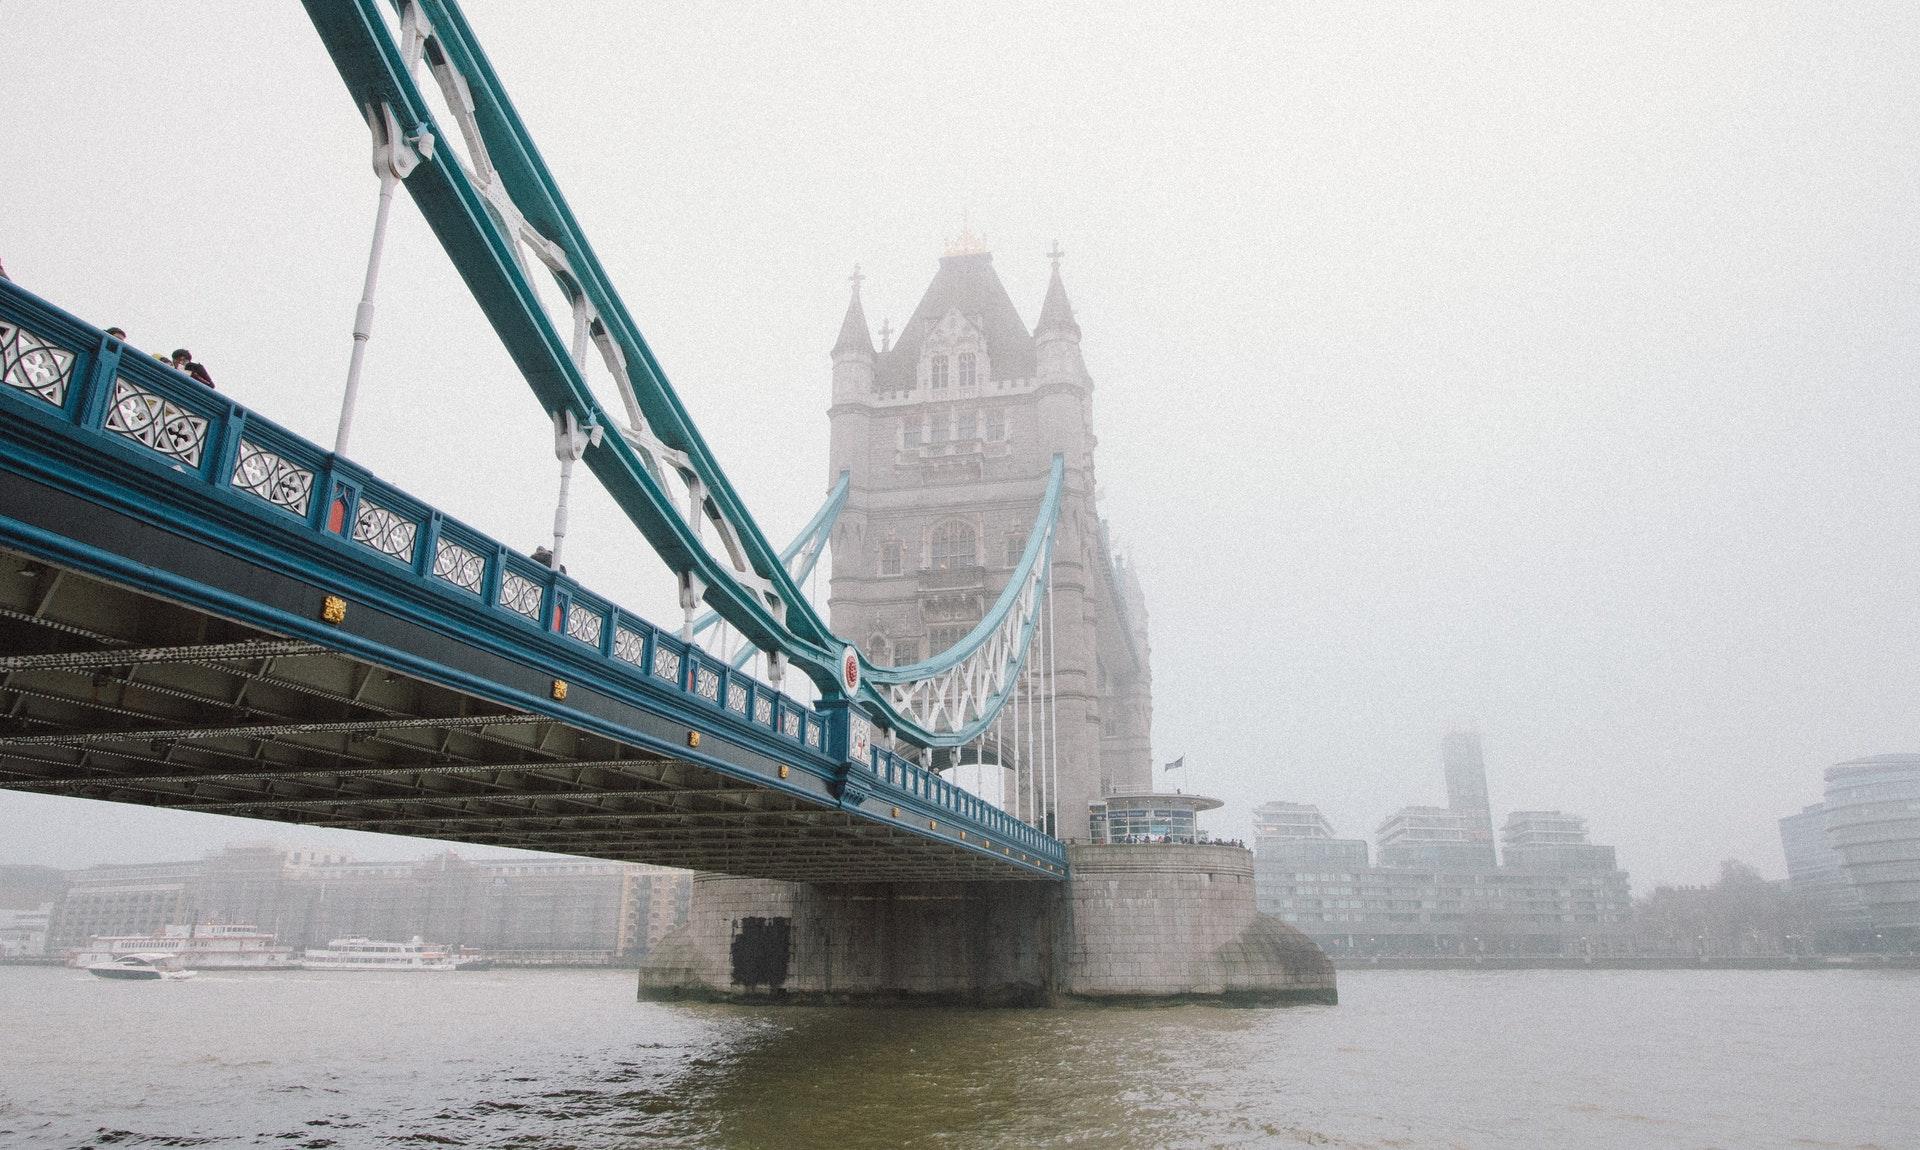 Tower Bridge tours